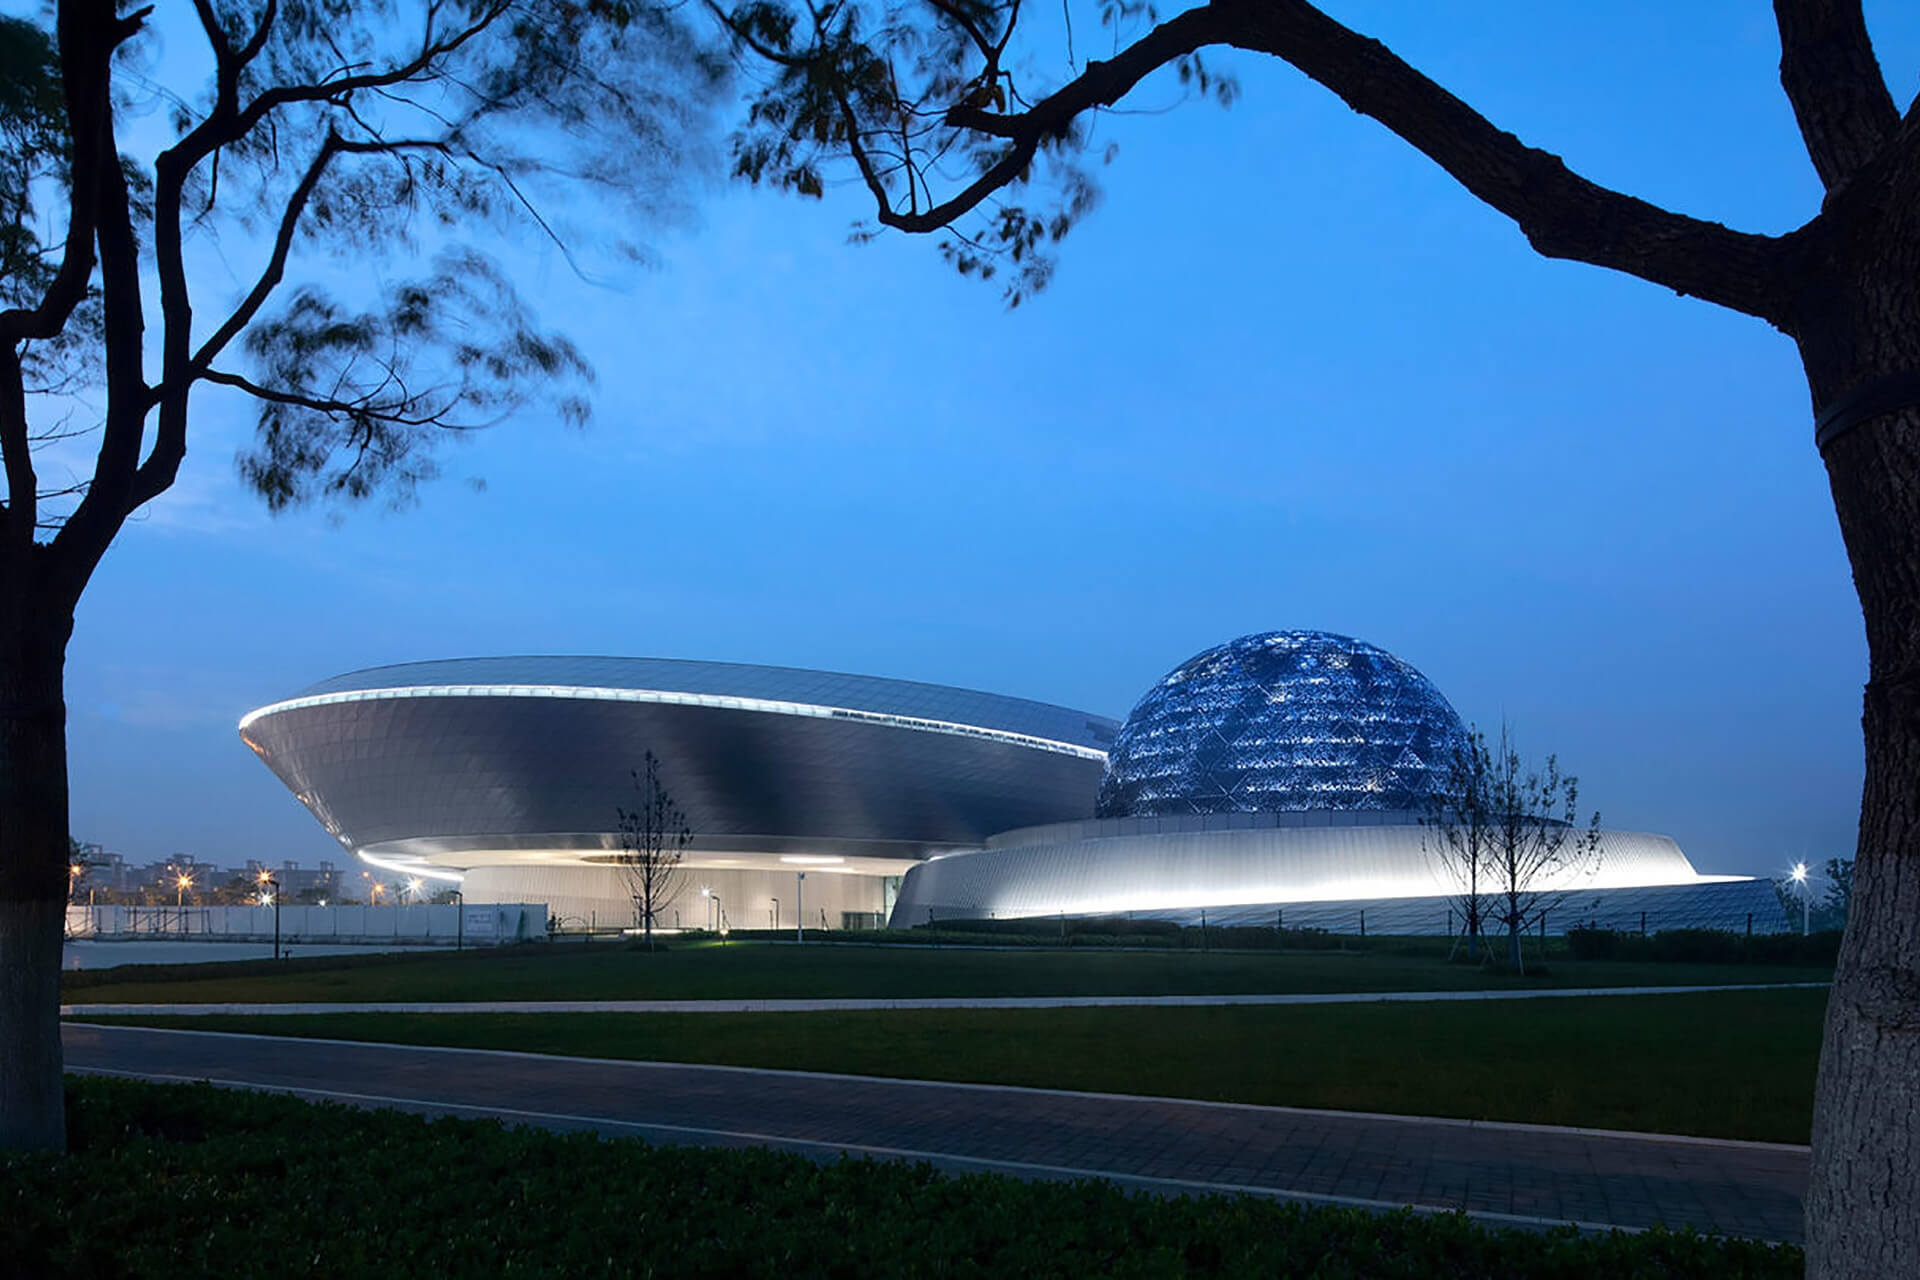 shanghai astronomy museum 2